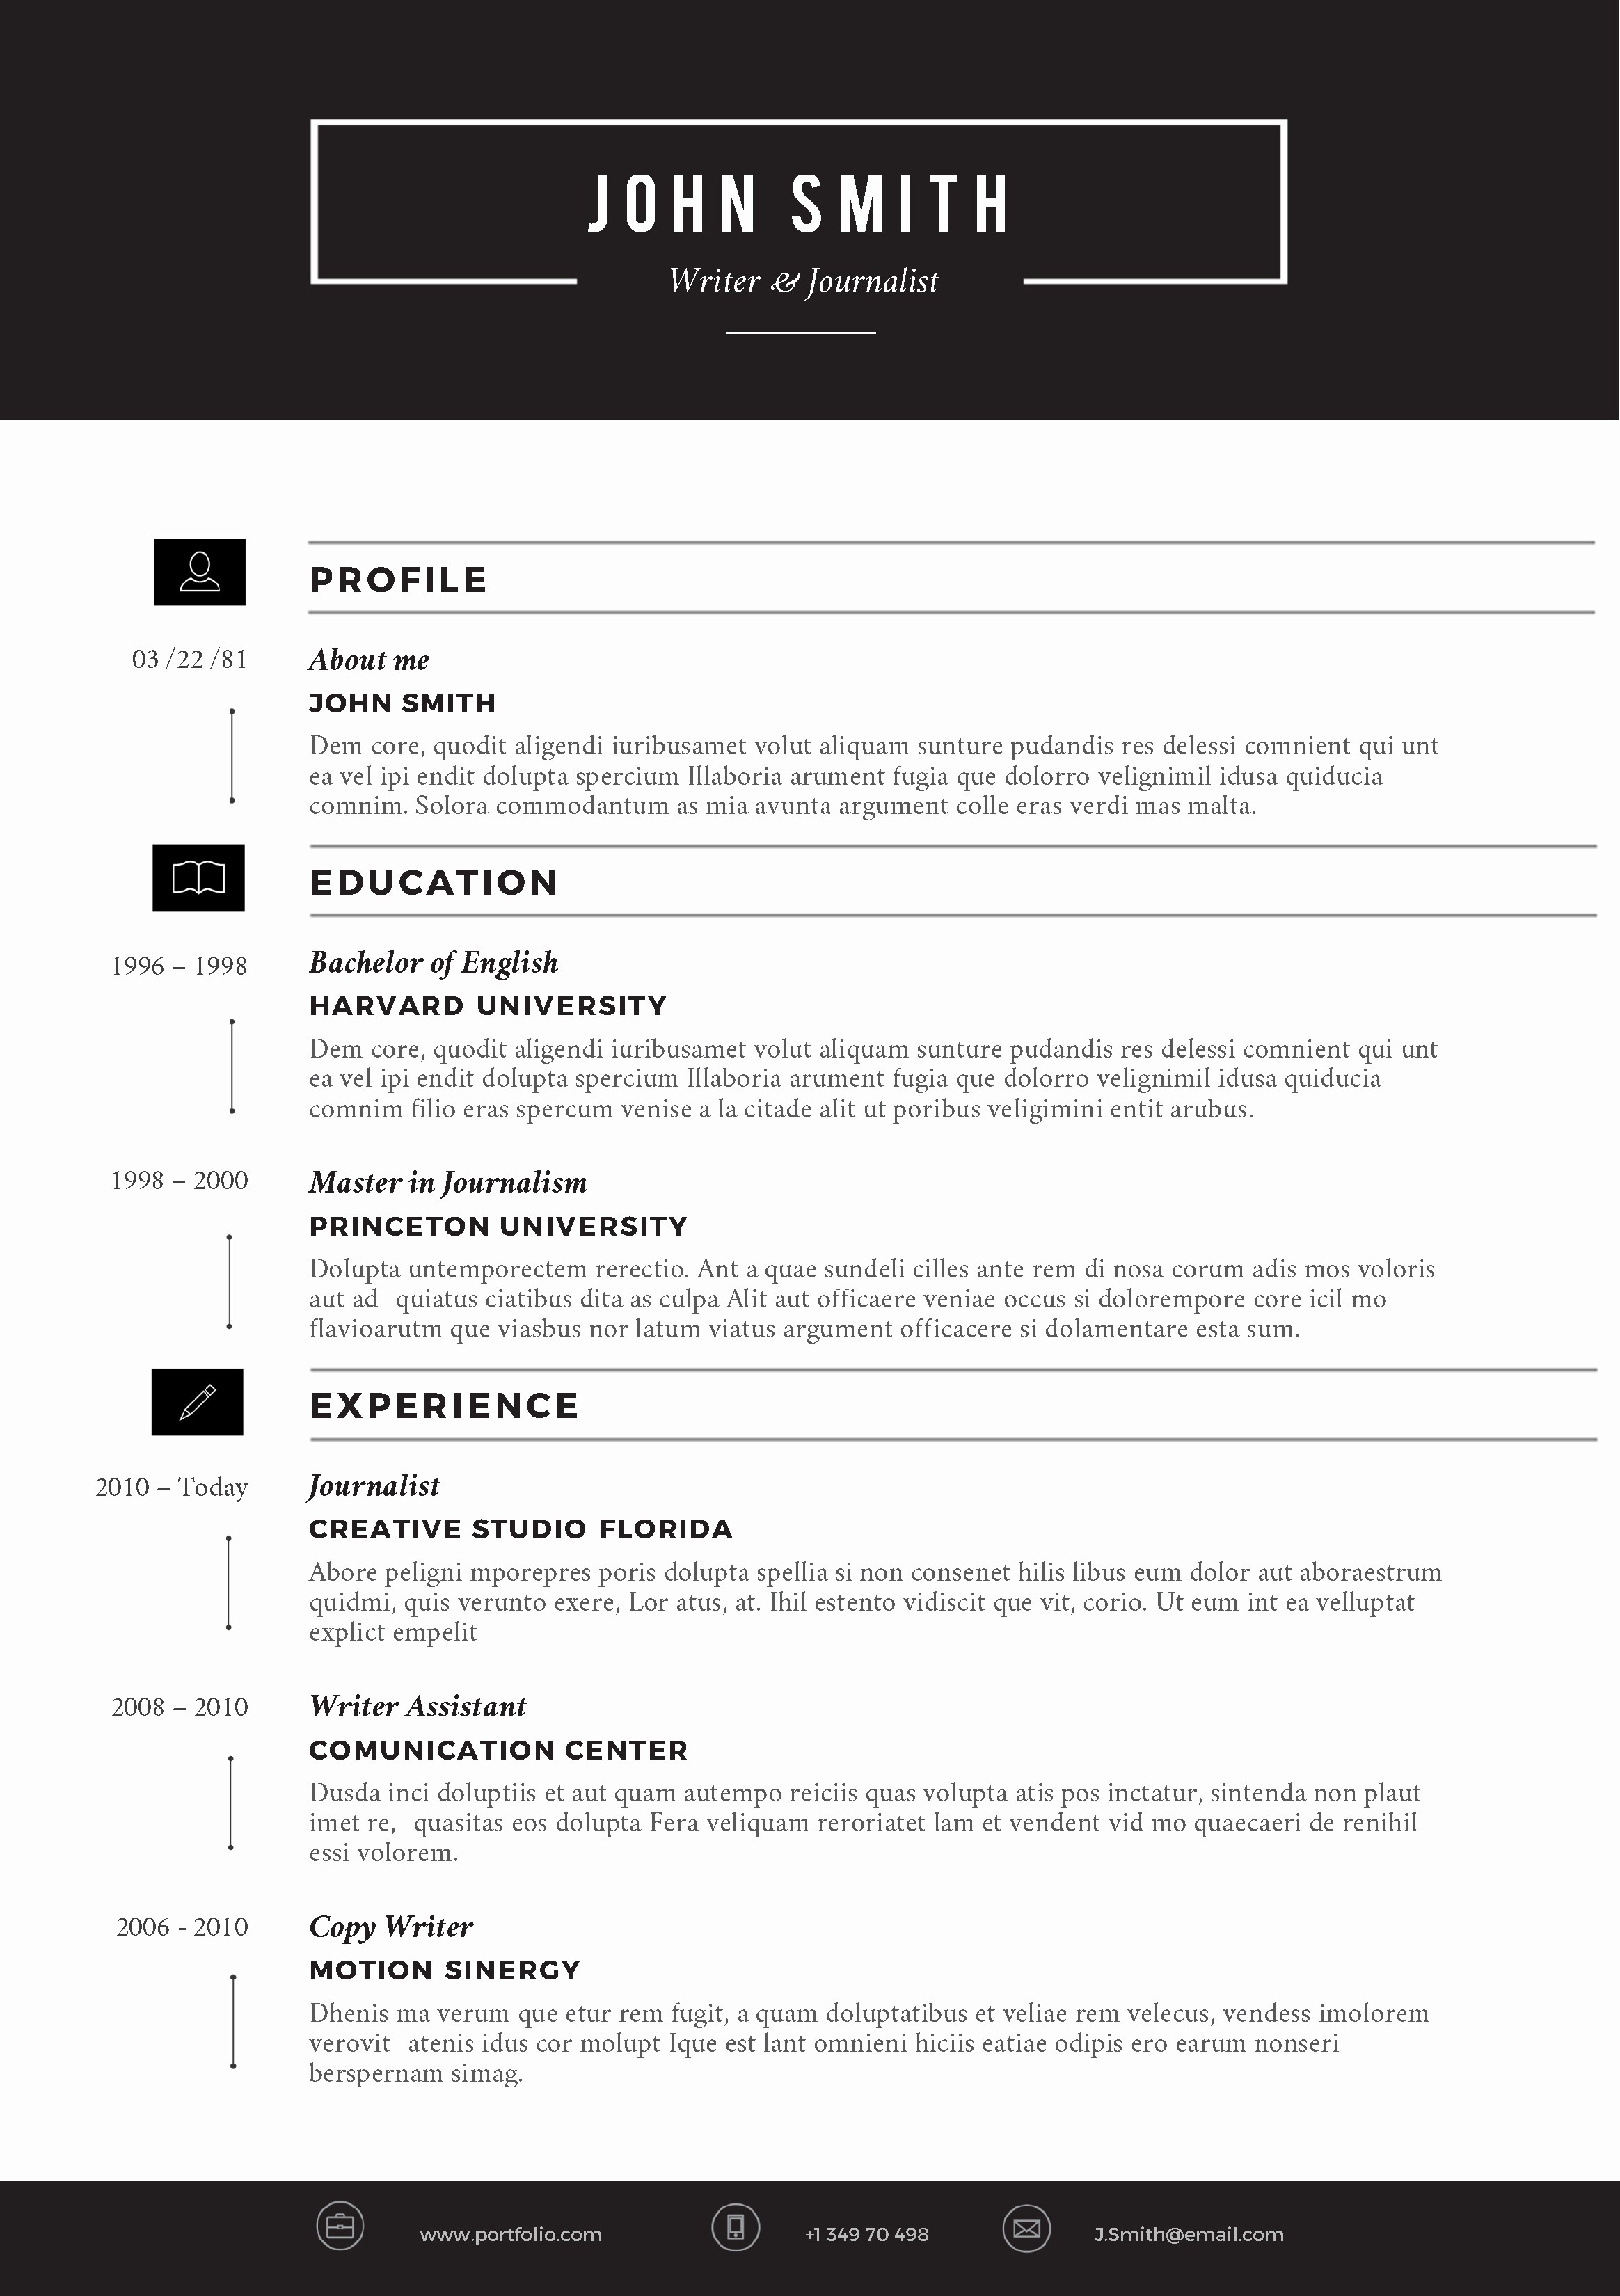 Creative Resume Template Microsoft Word Awesome Creative Resume Template by Cvfolio Resumes